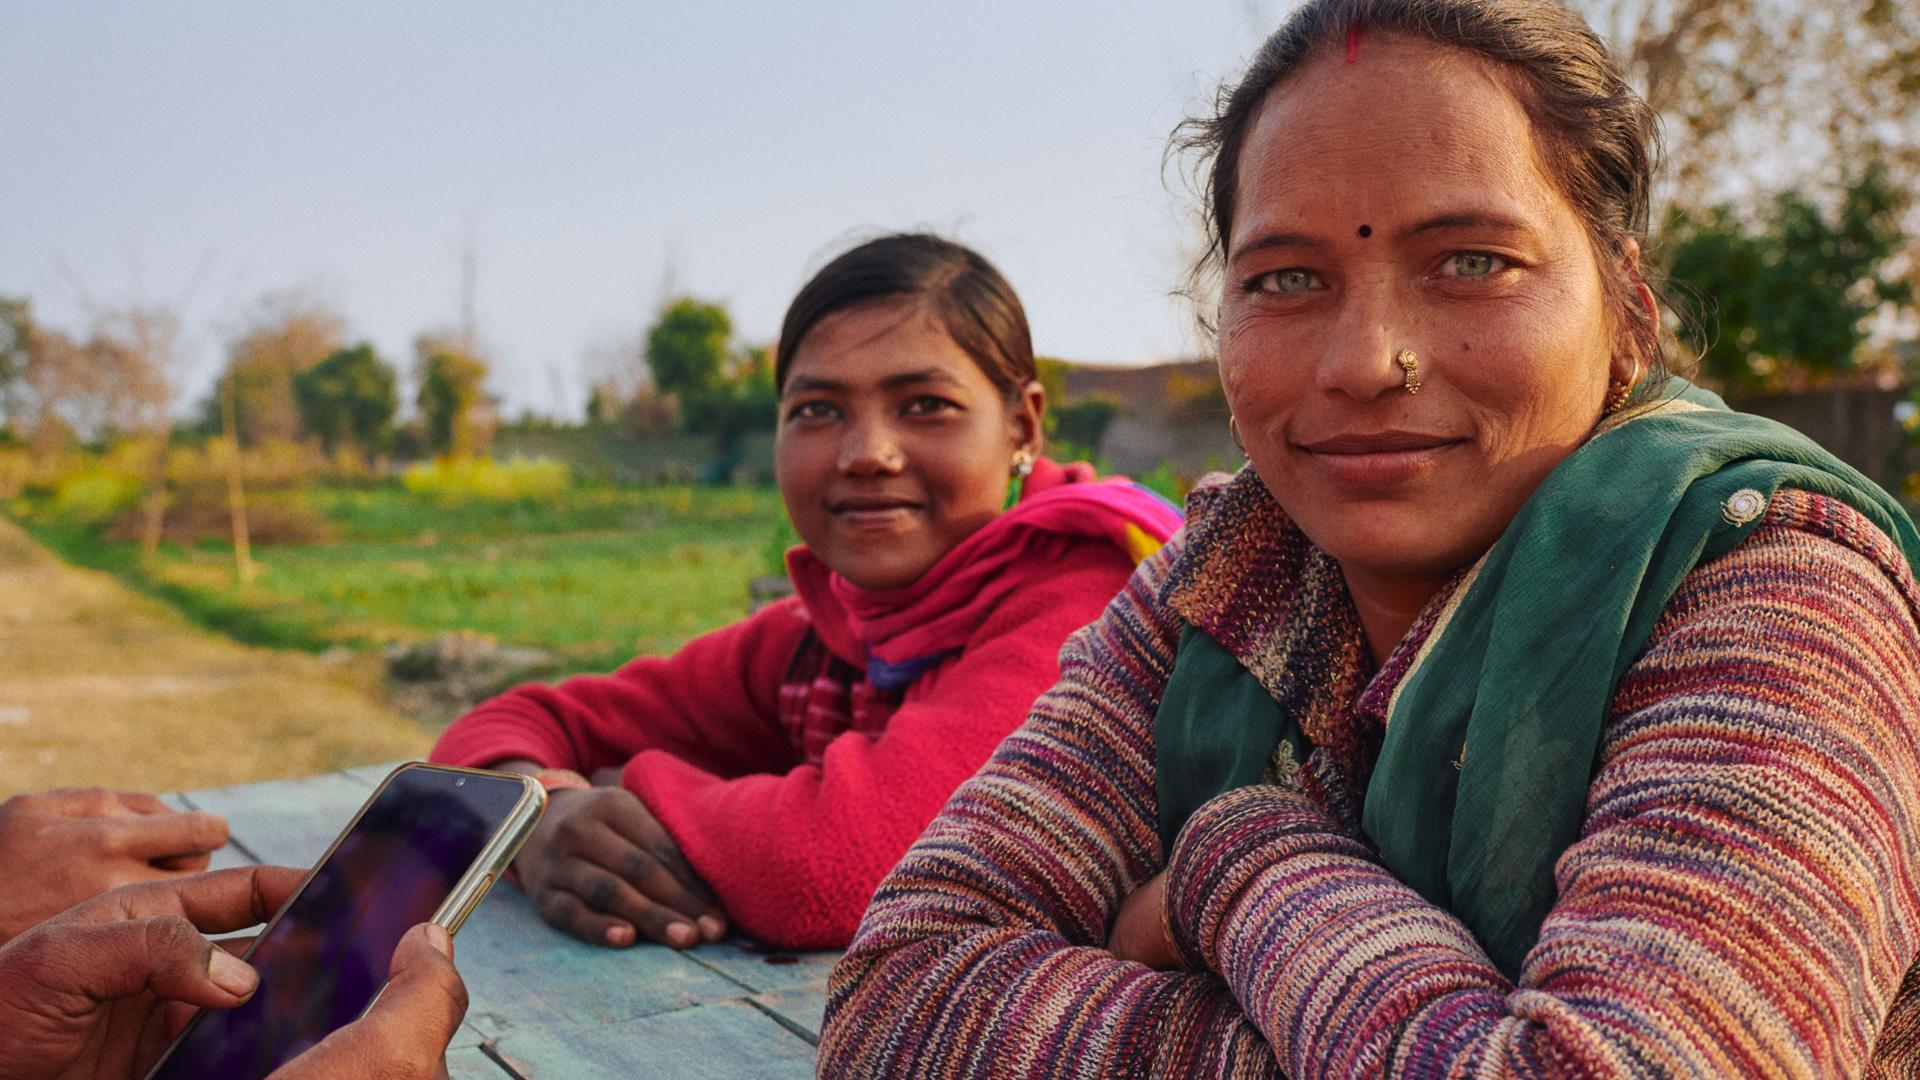 Photo of two women in Delhi, India